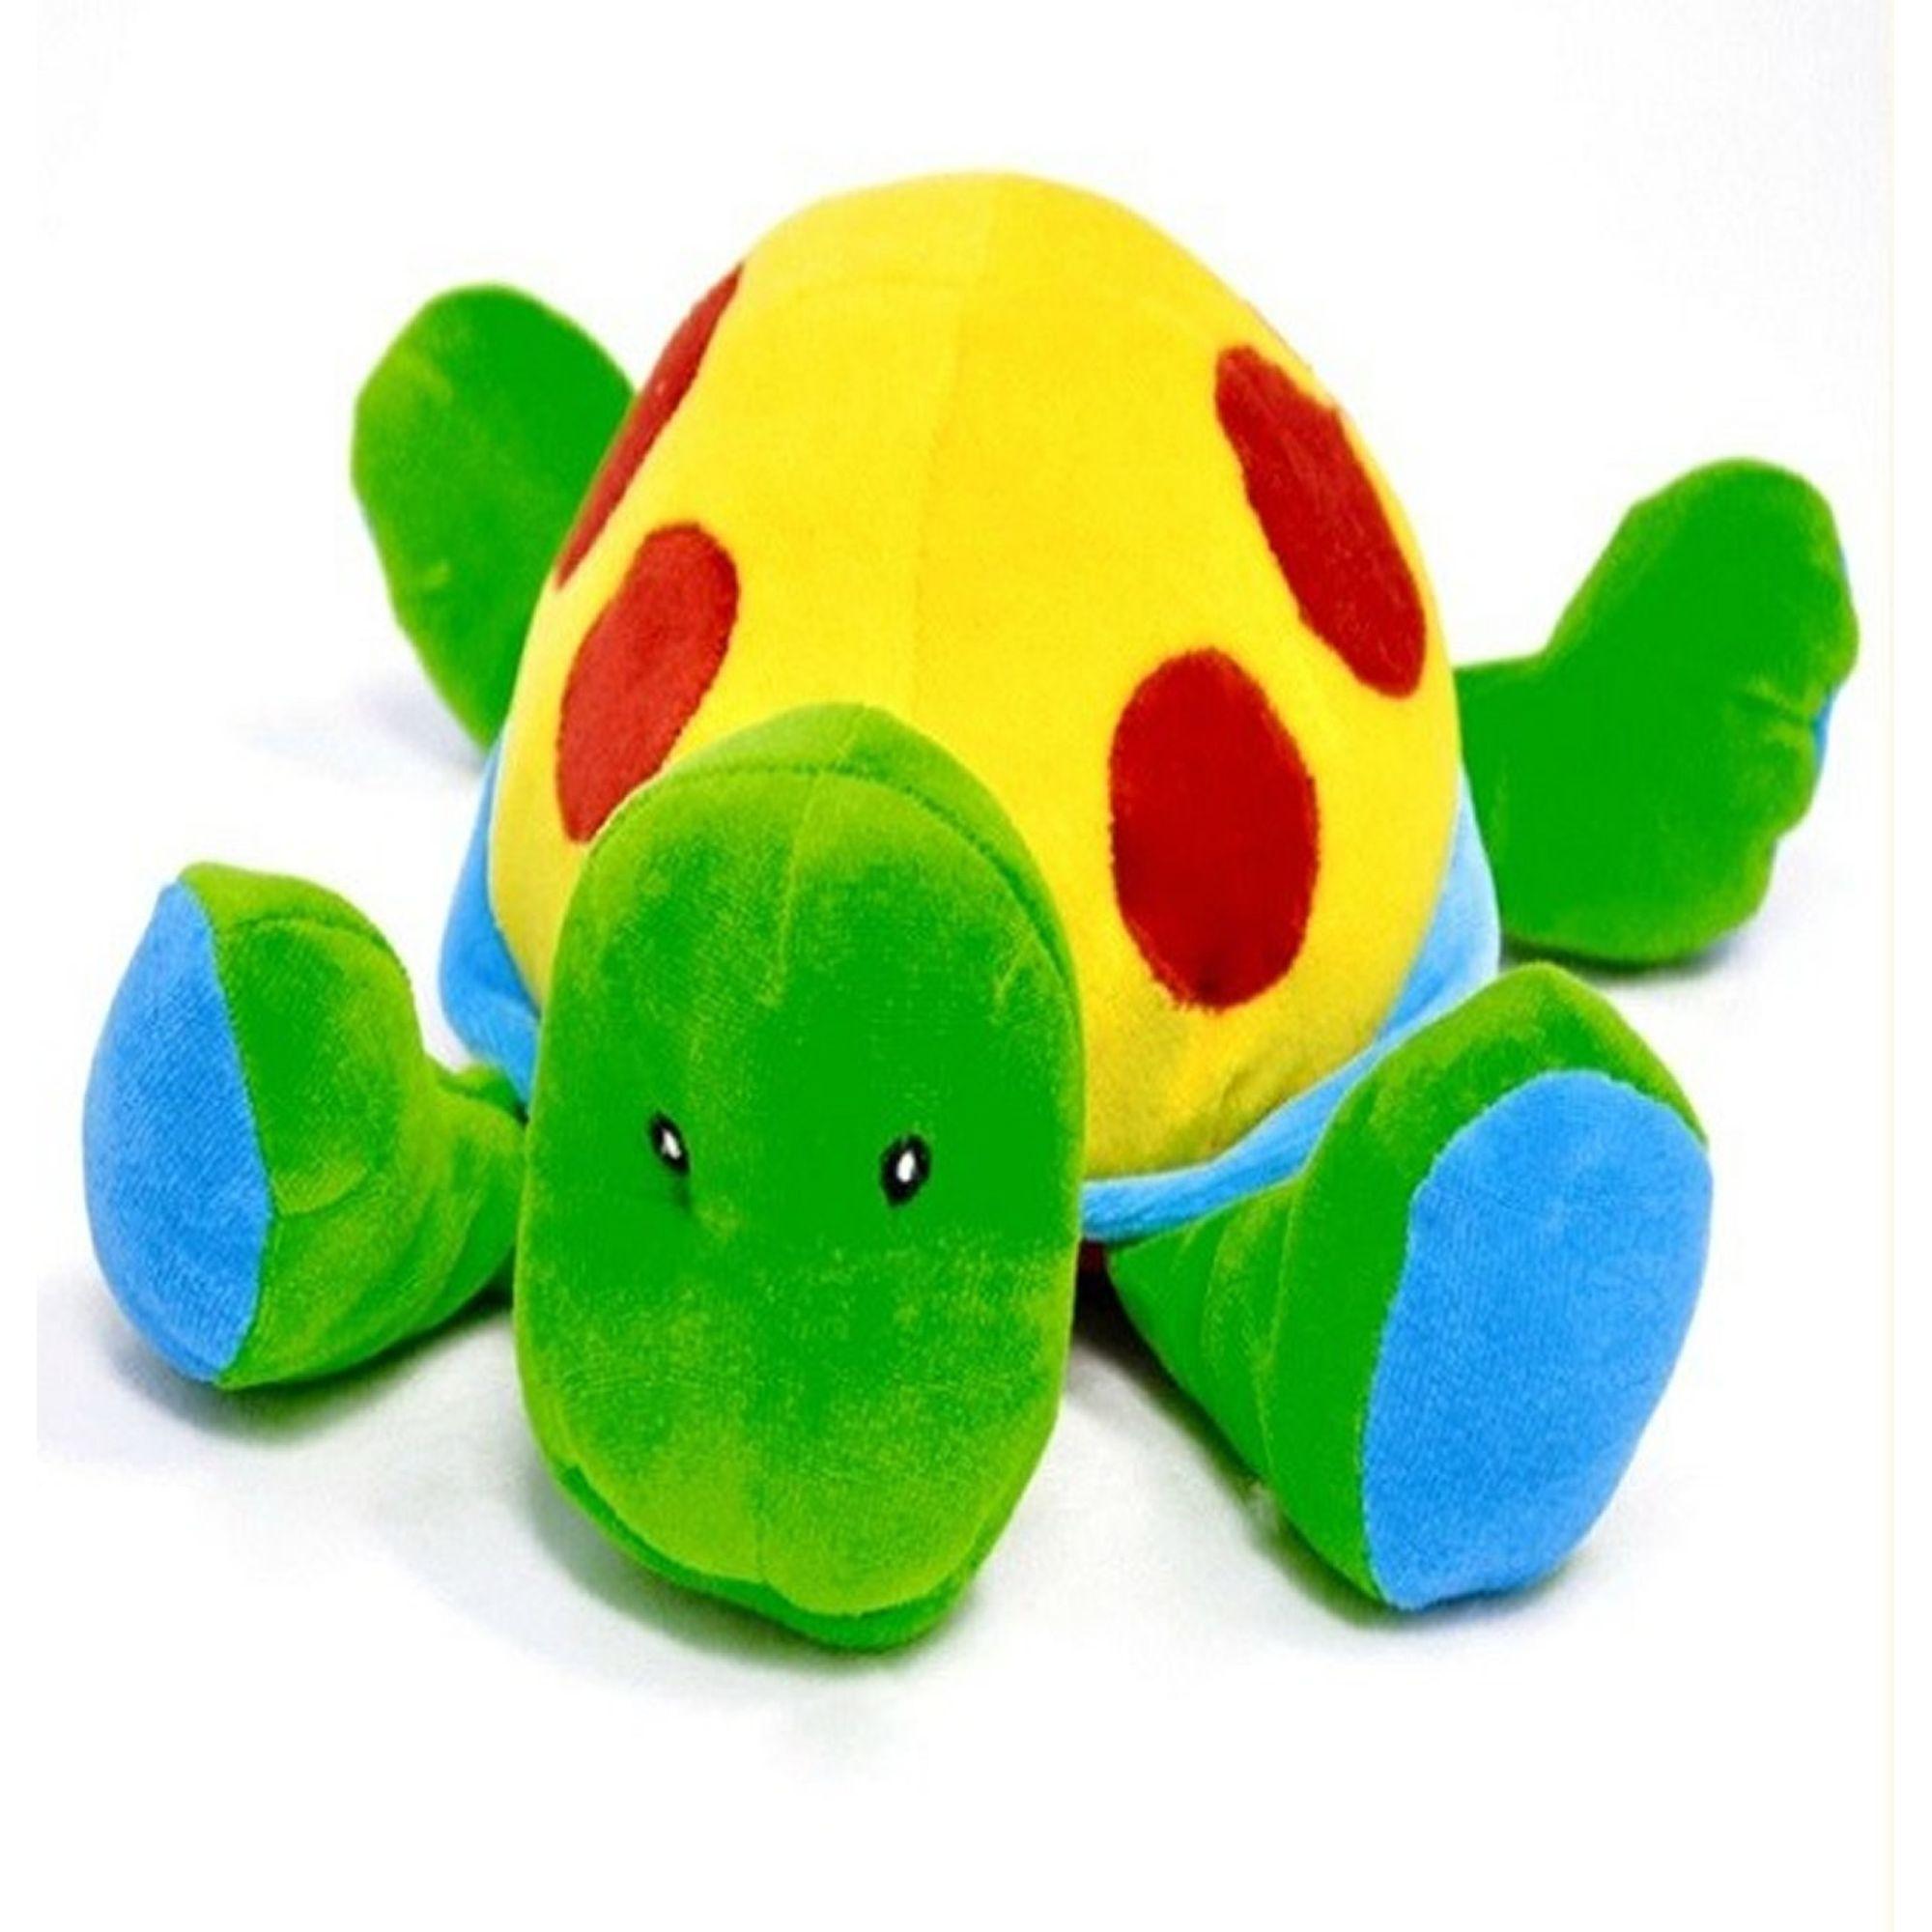 boneco-pelucia-tartaruga-colorida-com-barulho-ziptoys